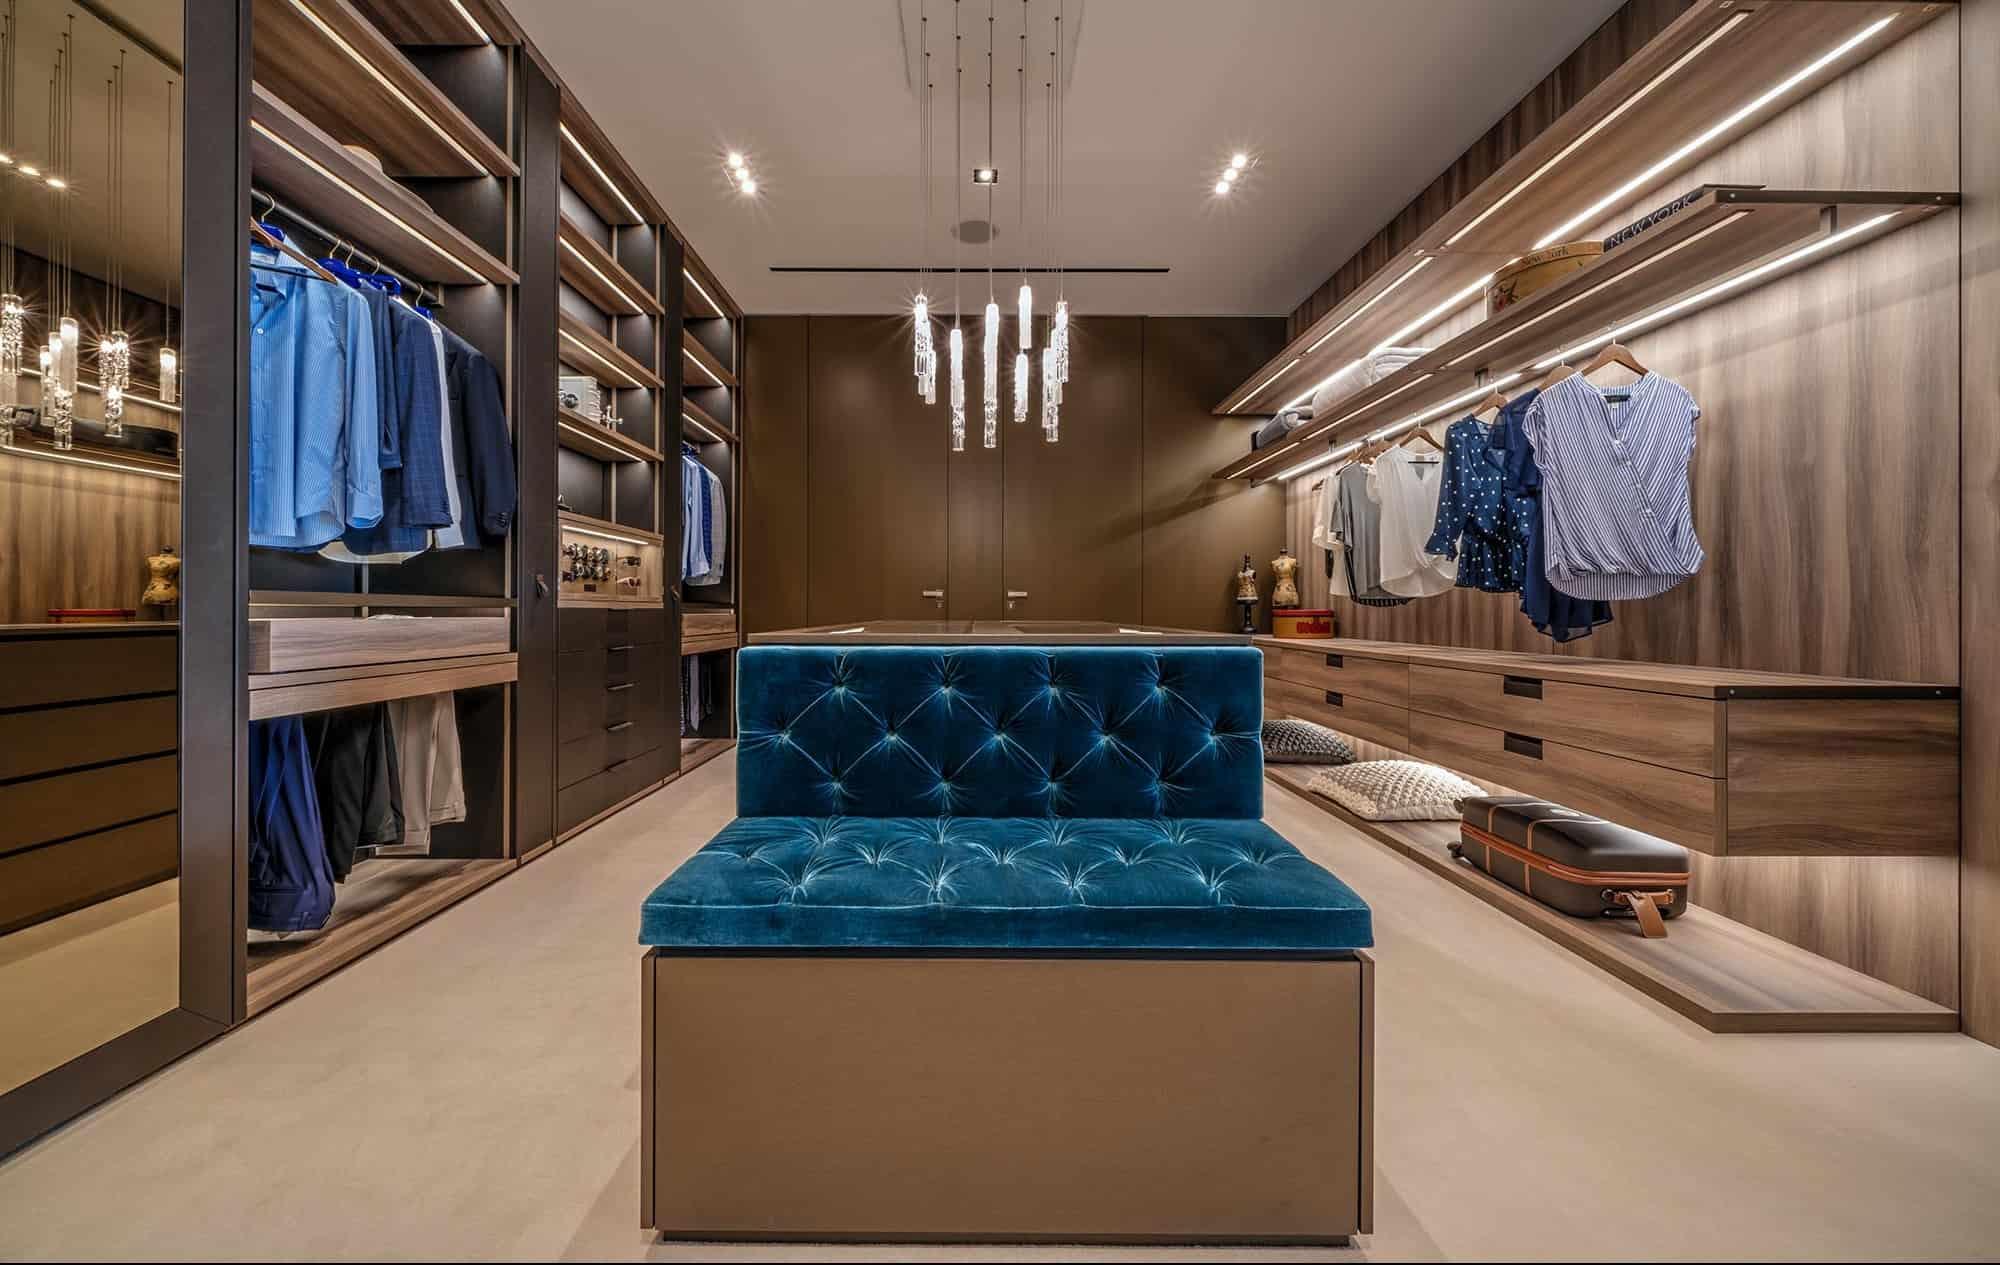 schmalenbach luxury german wardrobes and closet systems